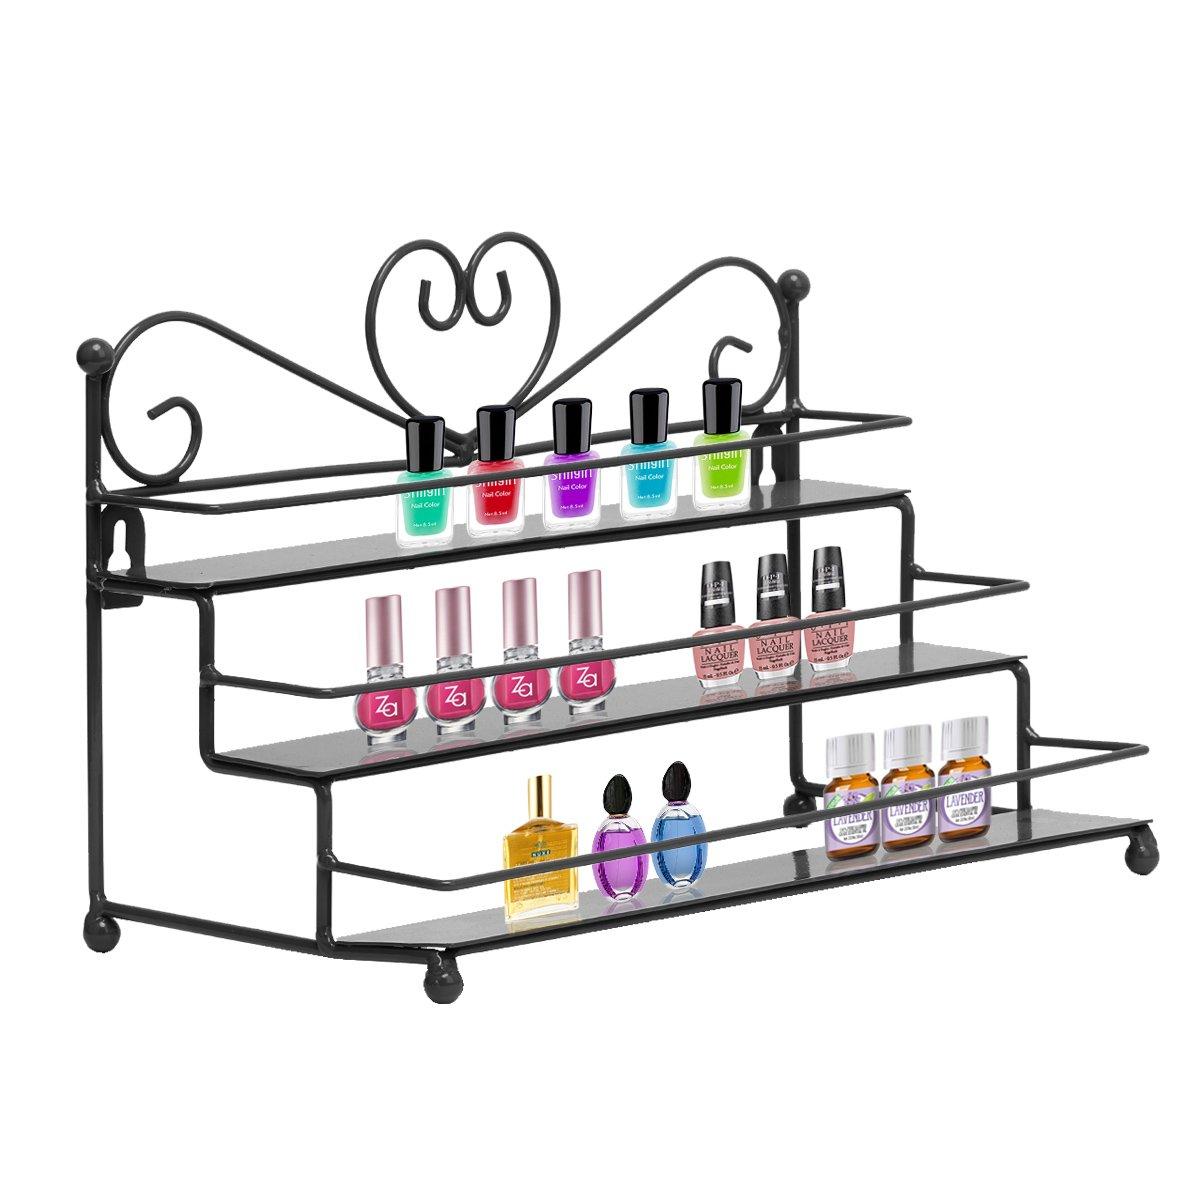 Dazone Mounted 3 Tier Metal Shelf Nail Polish Wall Rack Essential Oils Perfume Organizer by DAZONE